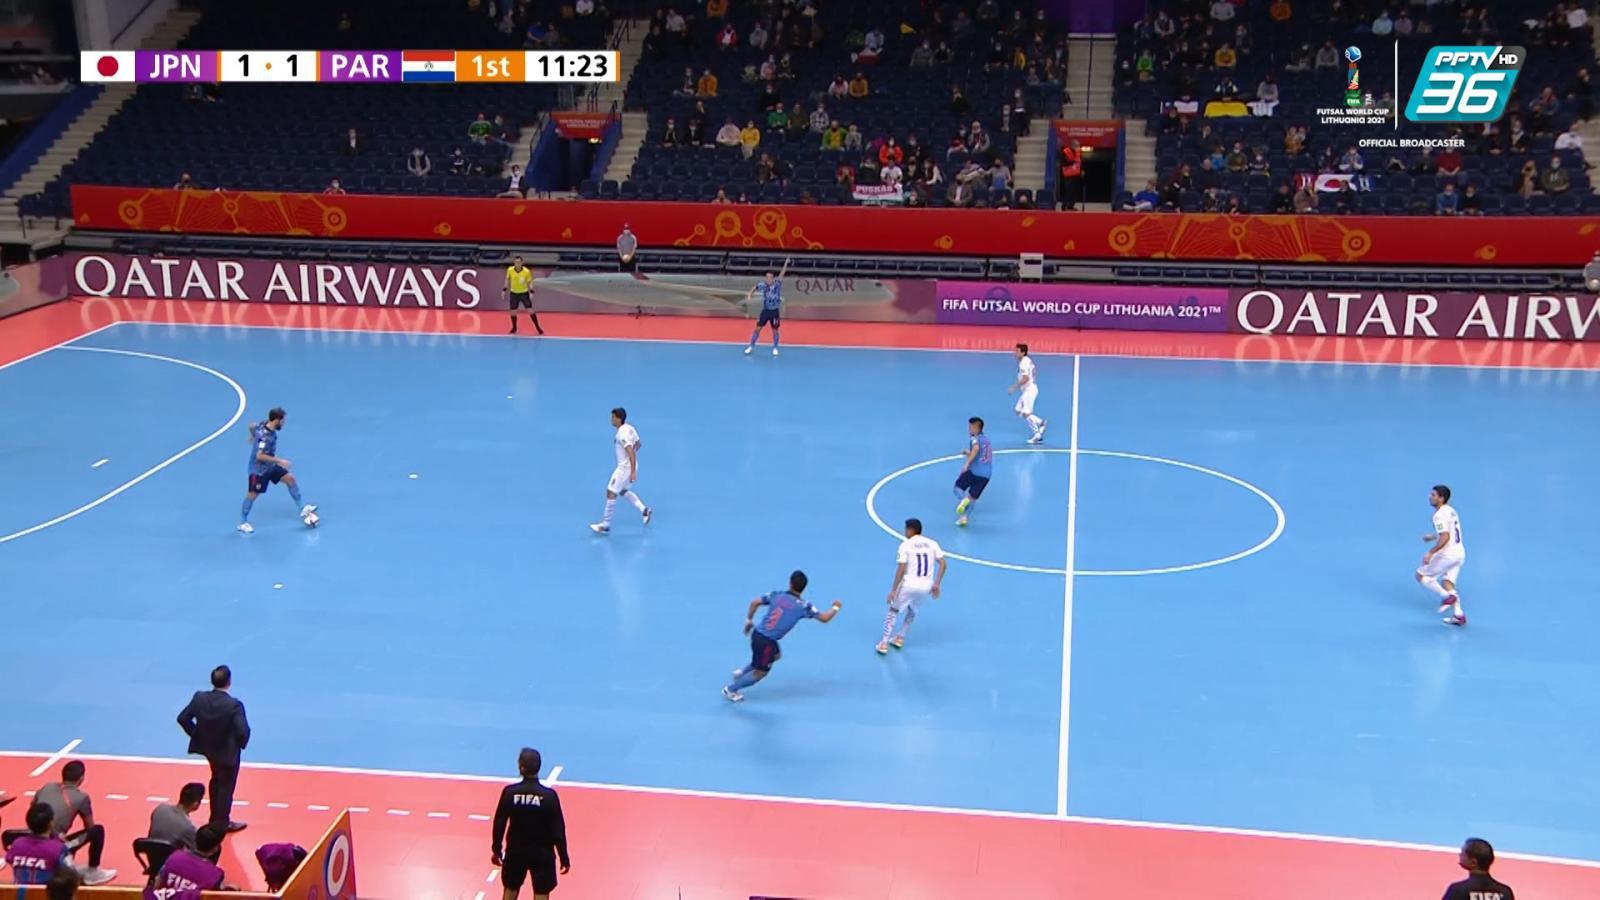 Full Match | ฟีฟ่า ฟุตซอล เวิลด์ คัพ 2021 | ญี่ปุ่น 1-2 ปารากวัย | 20 ก.ย. 64